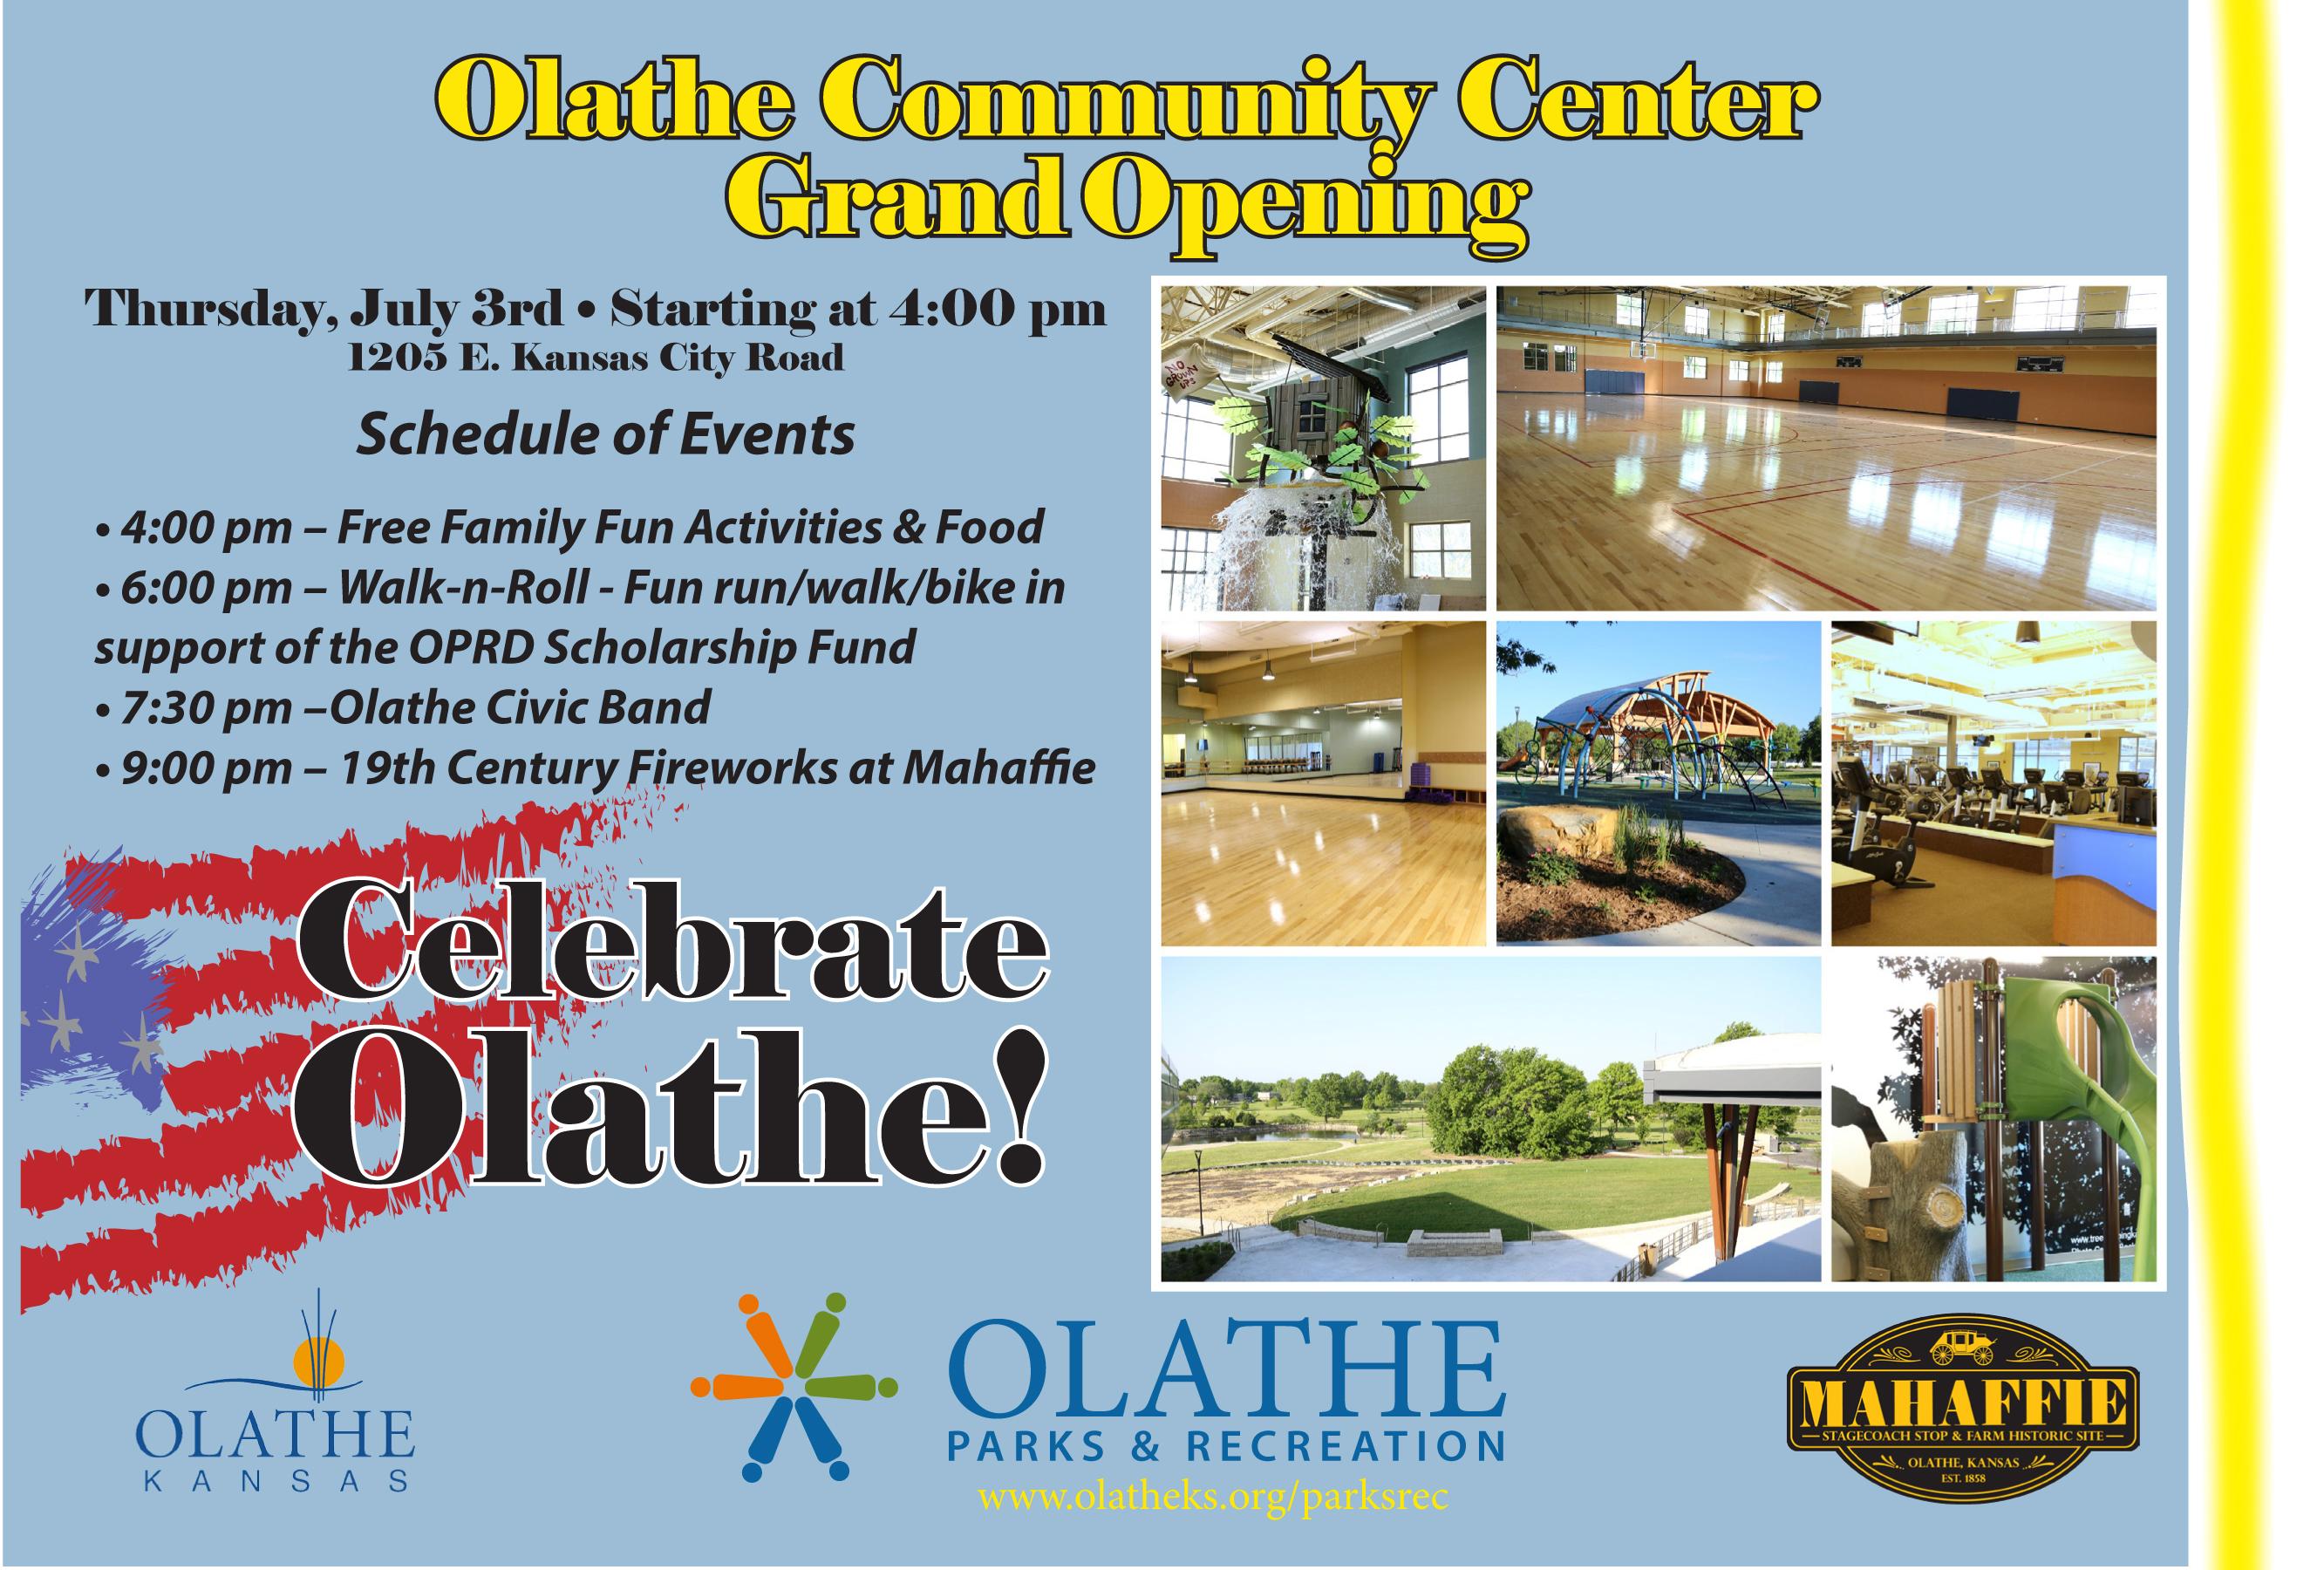 Olathe Community Center Family Fun Event